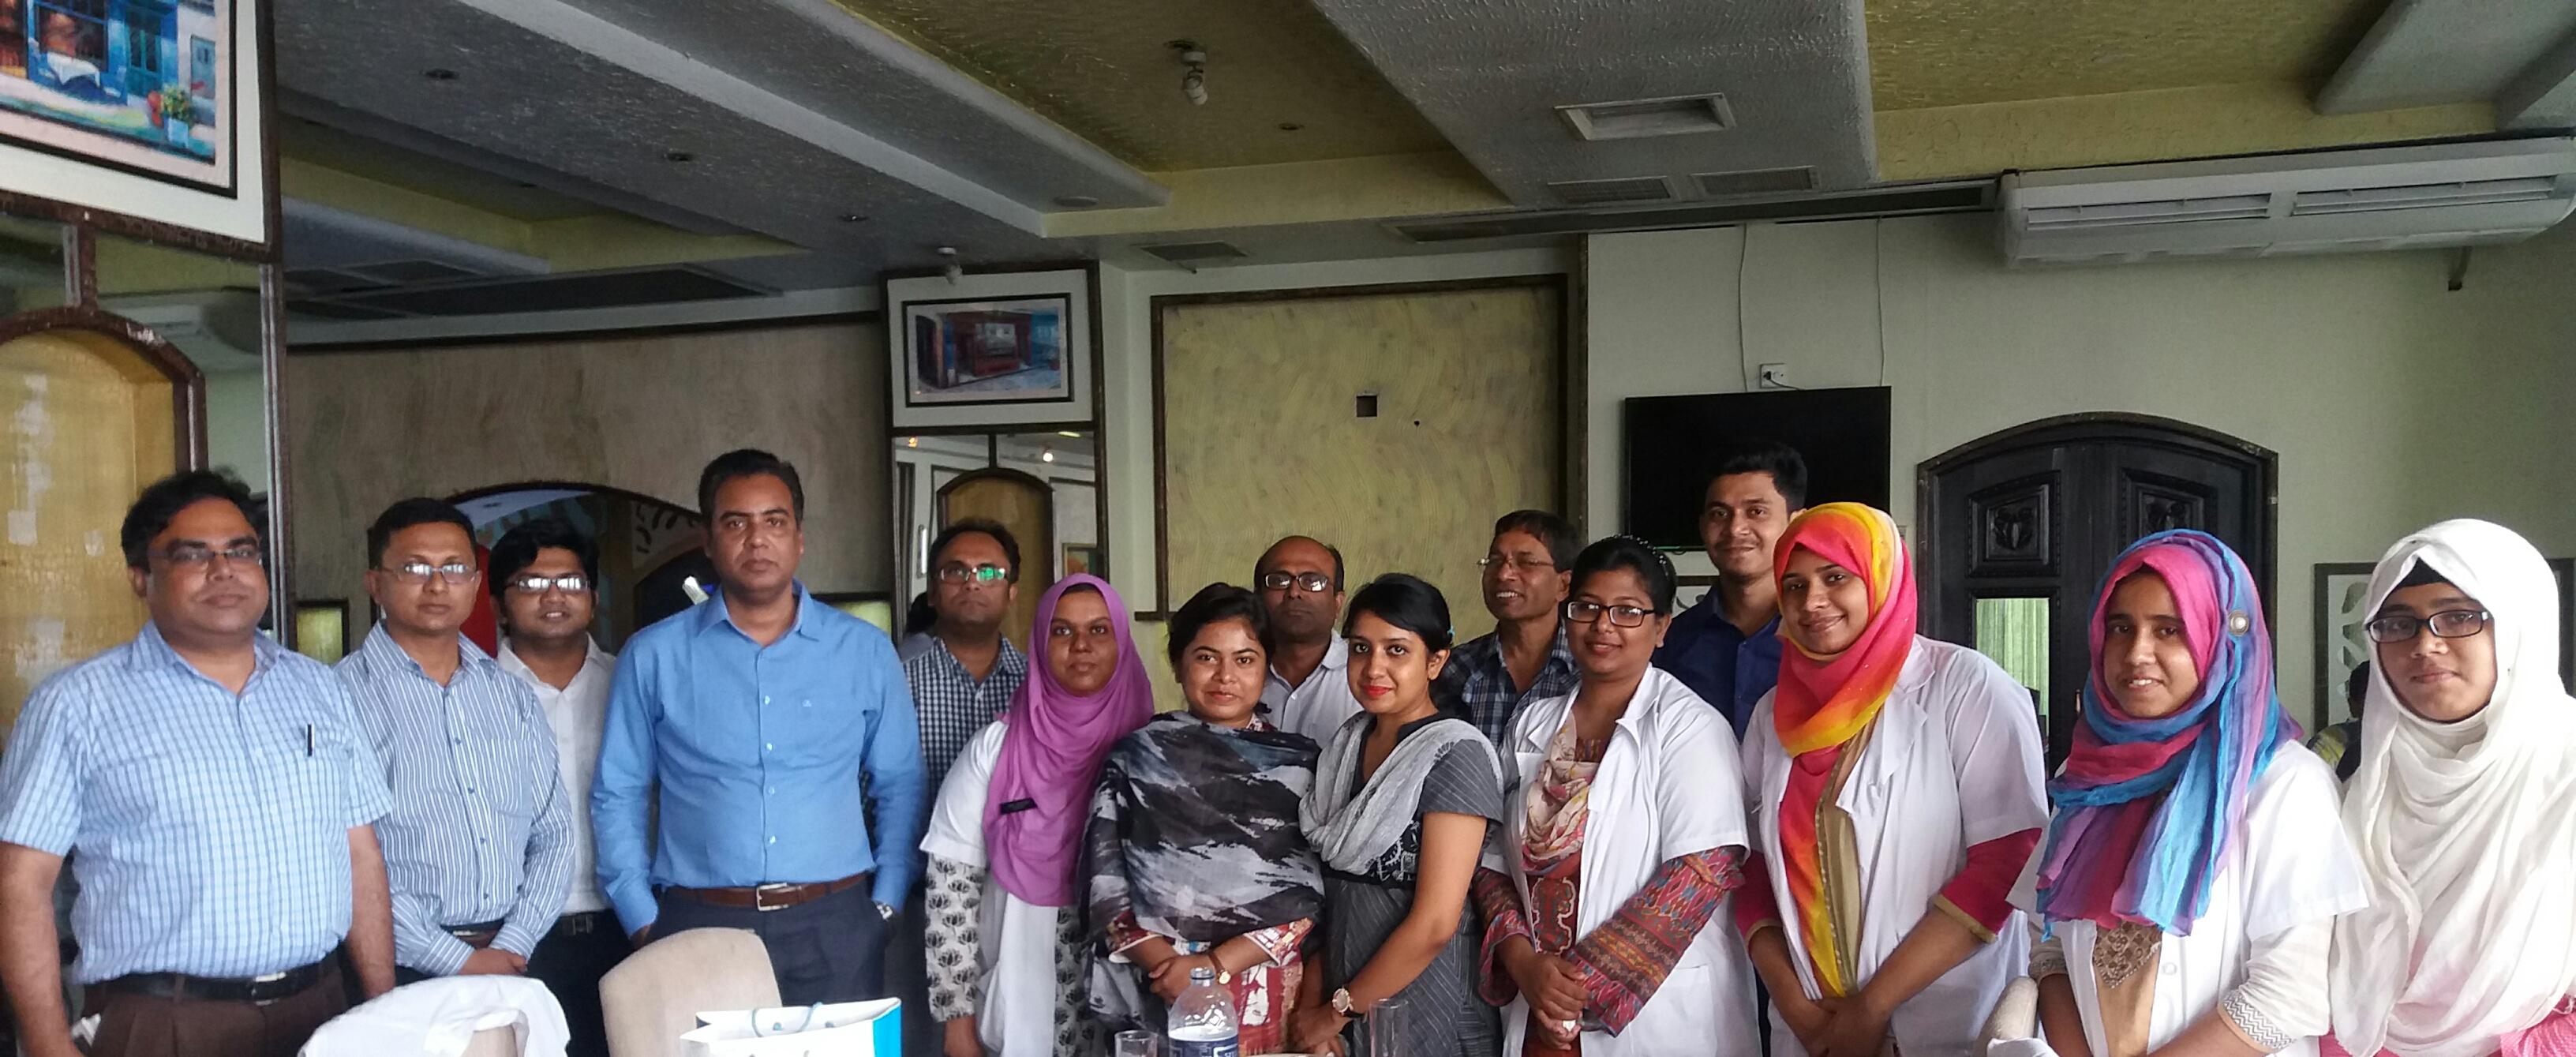 "Julphar Bangladesh Holds CME on ""EASL 2017 Clinical Practice Guidelines on the Management of Hepatitis-B Virus Infection"""